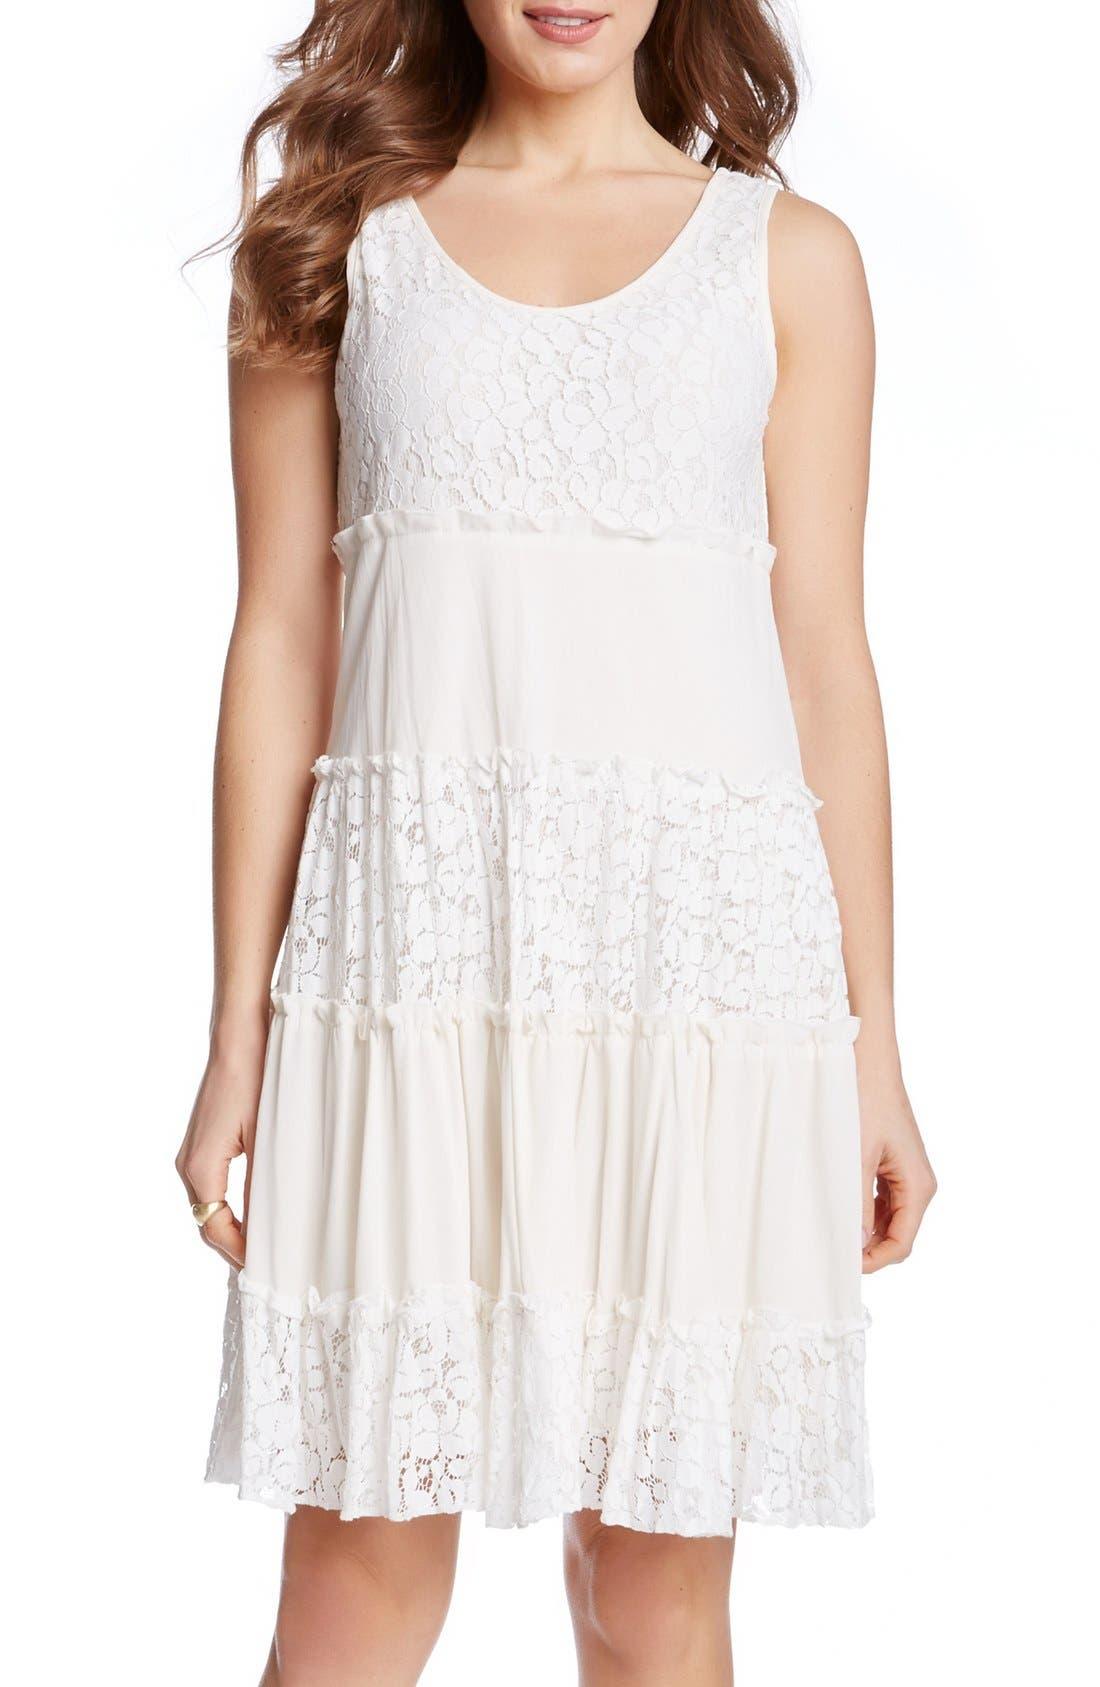 Main Image - Karen Kane 'Tara' Tiered Lace A-Line Dress